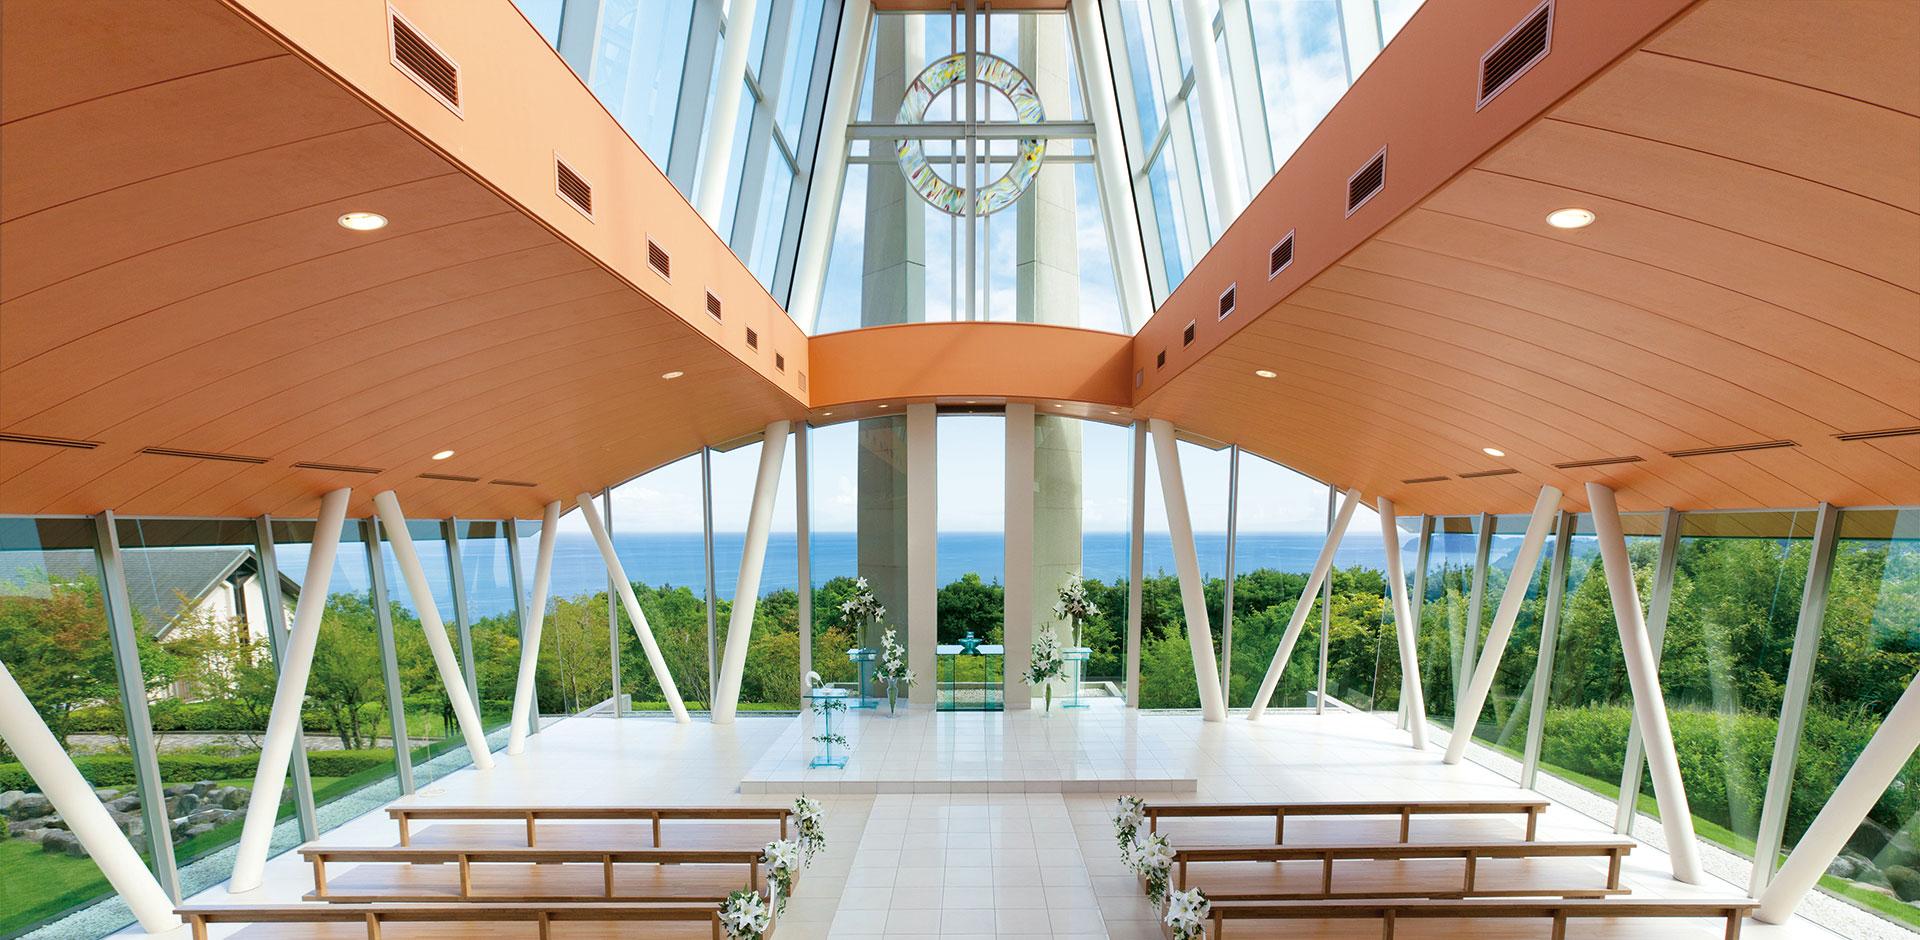 ODAWARA Crystal Grace Chapel